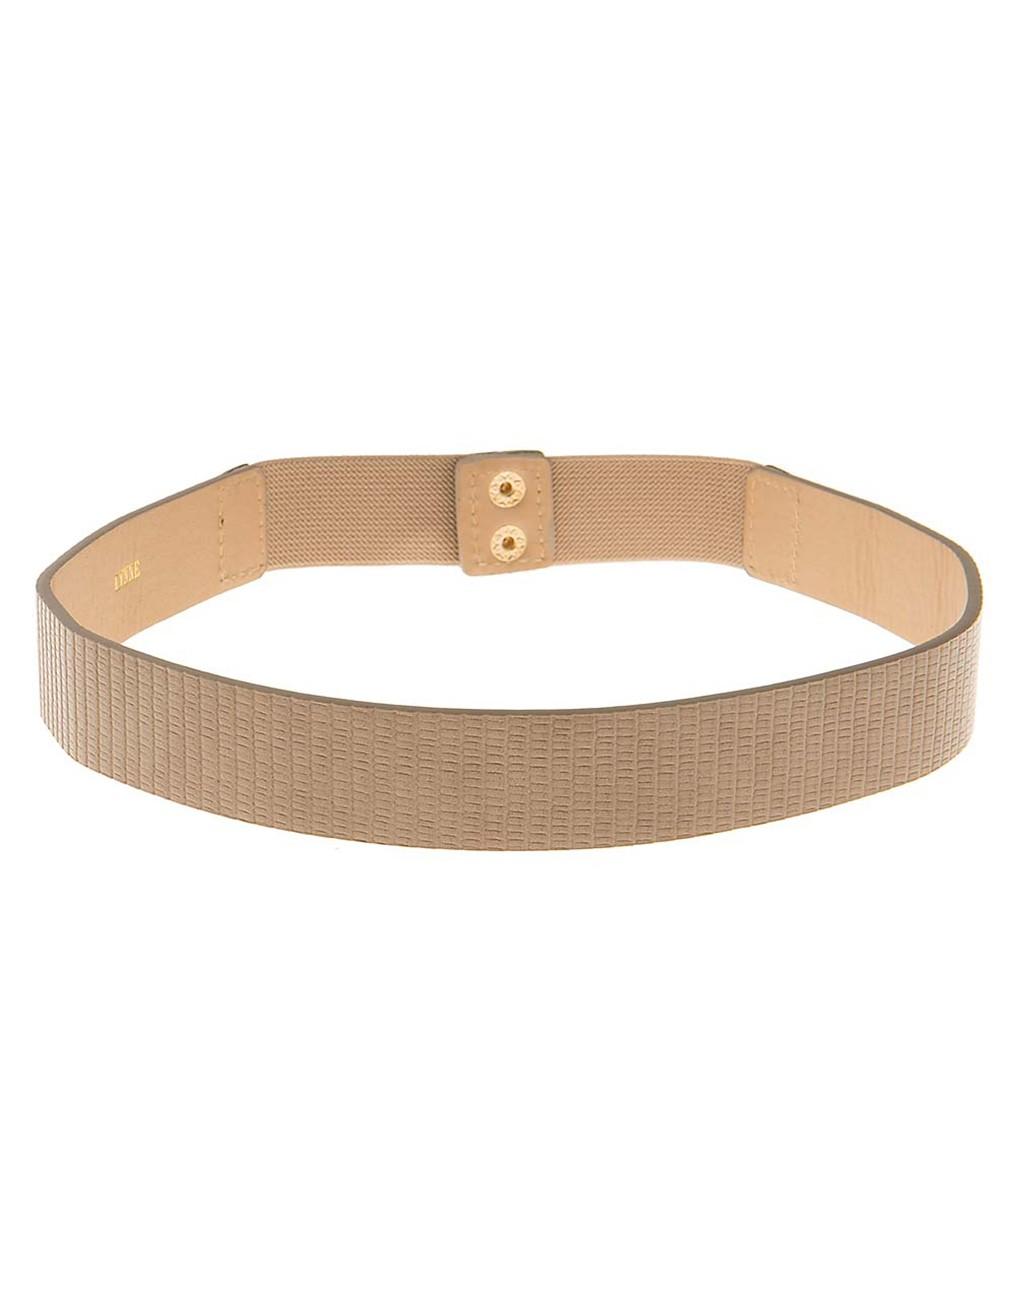 Croco waist belt